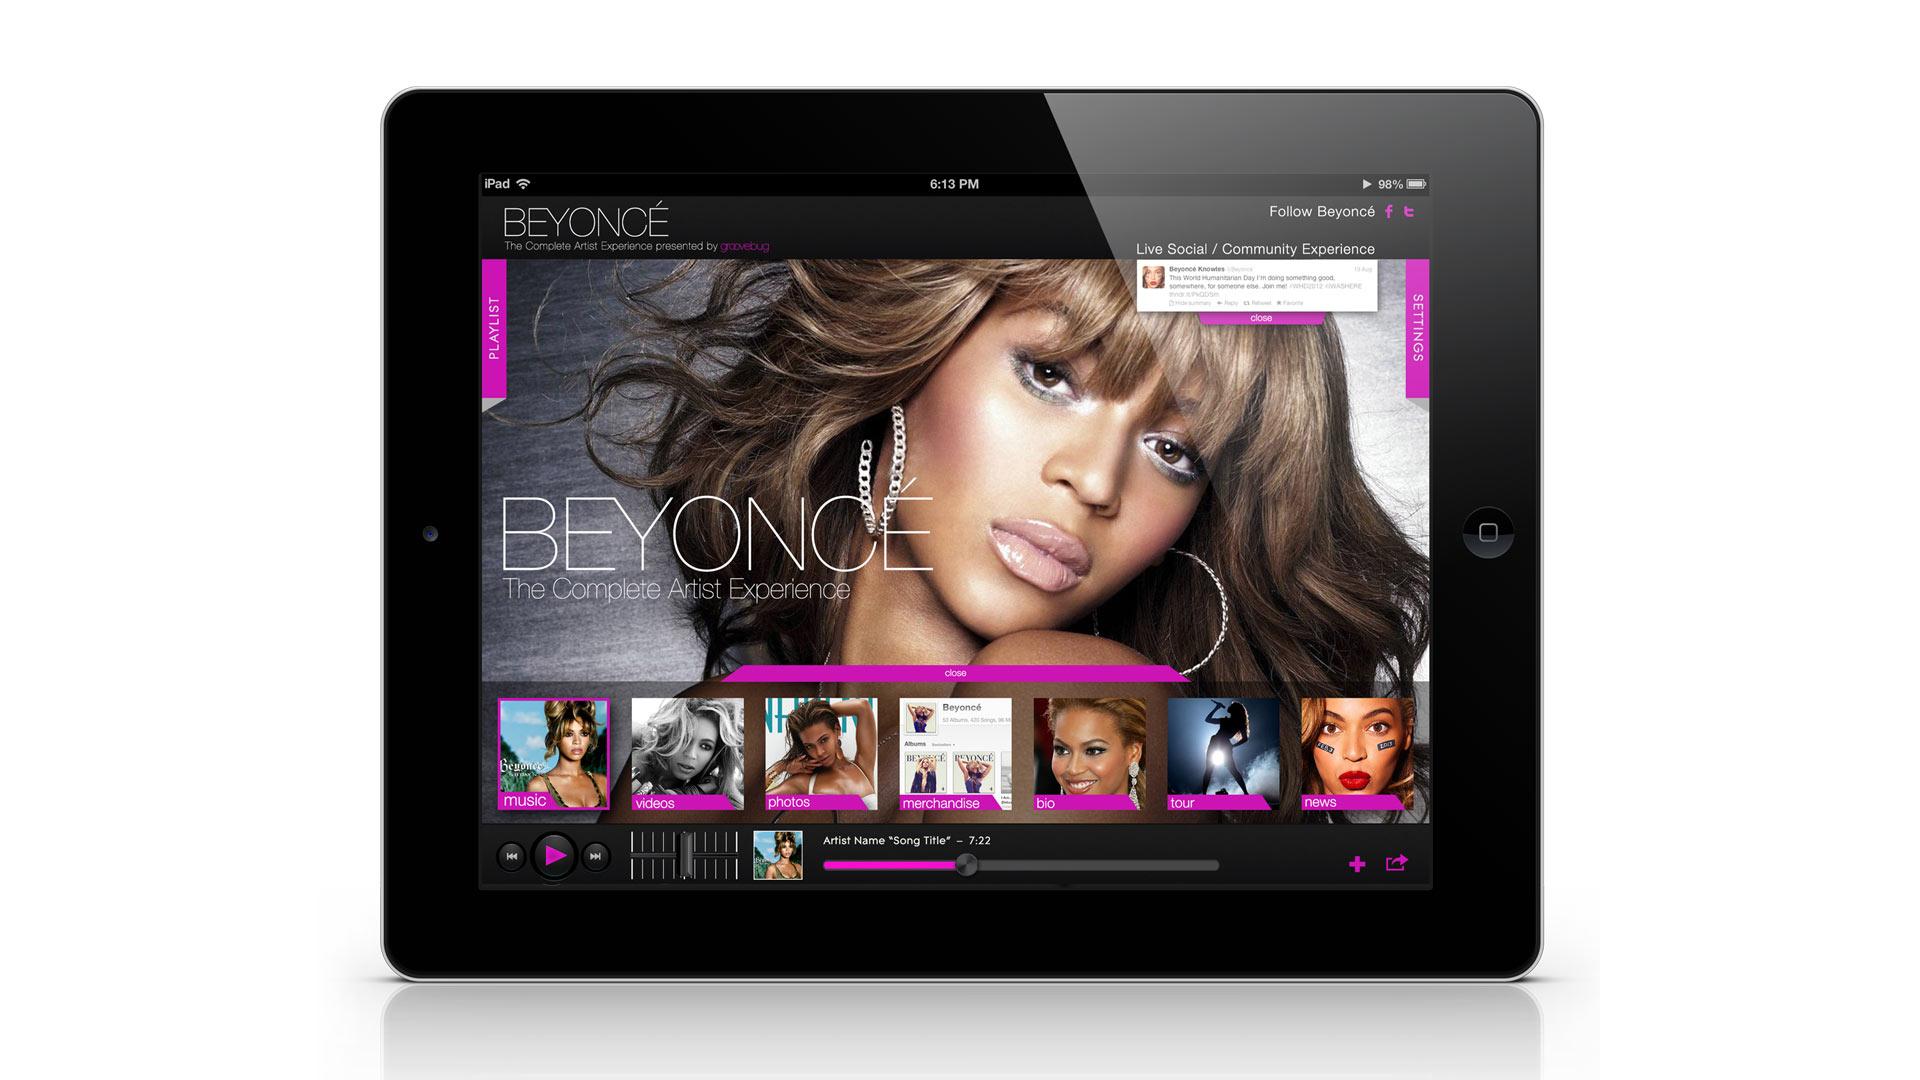 Beyonce_COncept.jpg